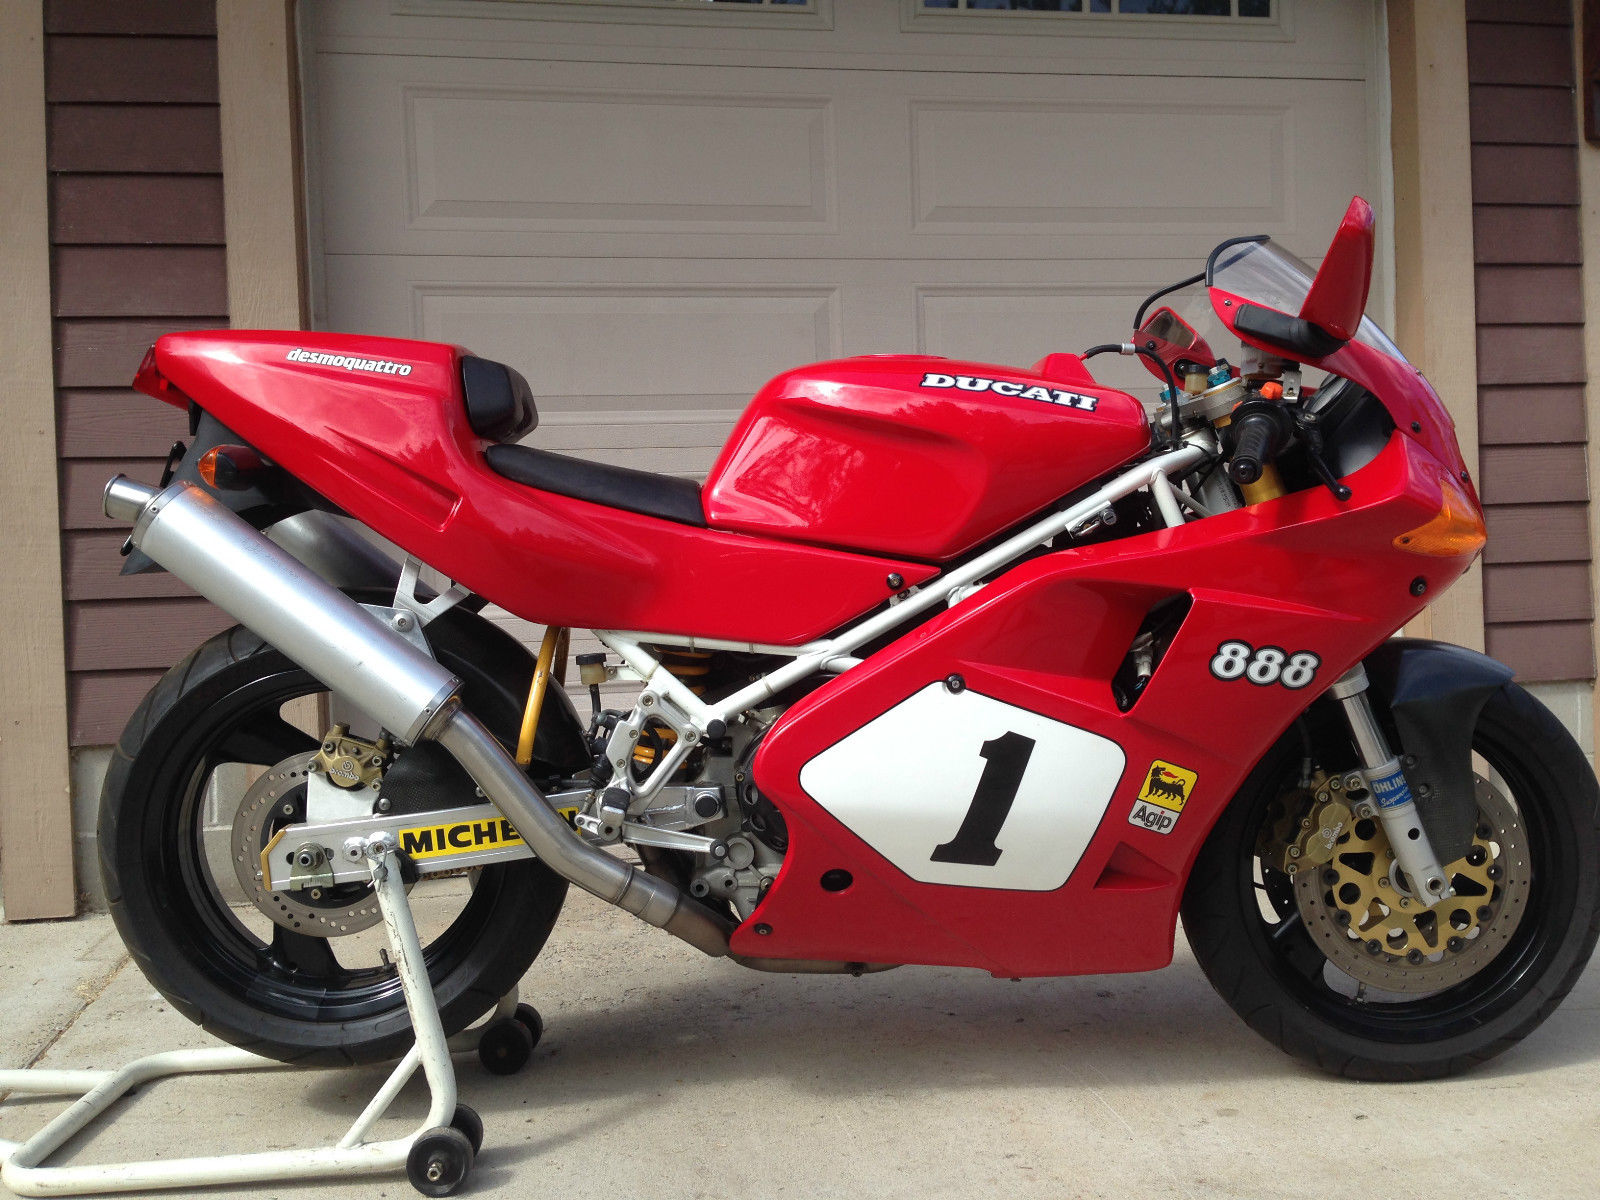 1992 ducati 888 sp4   bike-urious